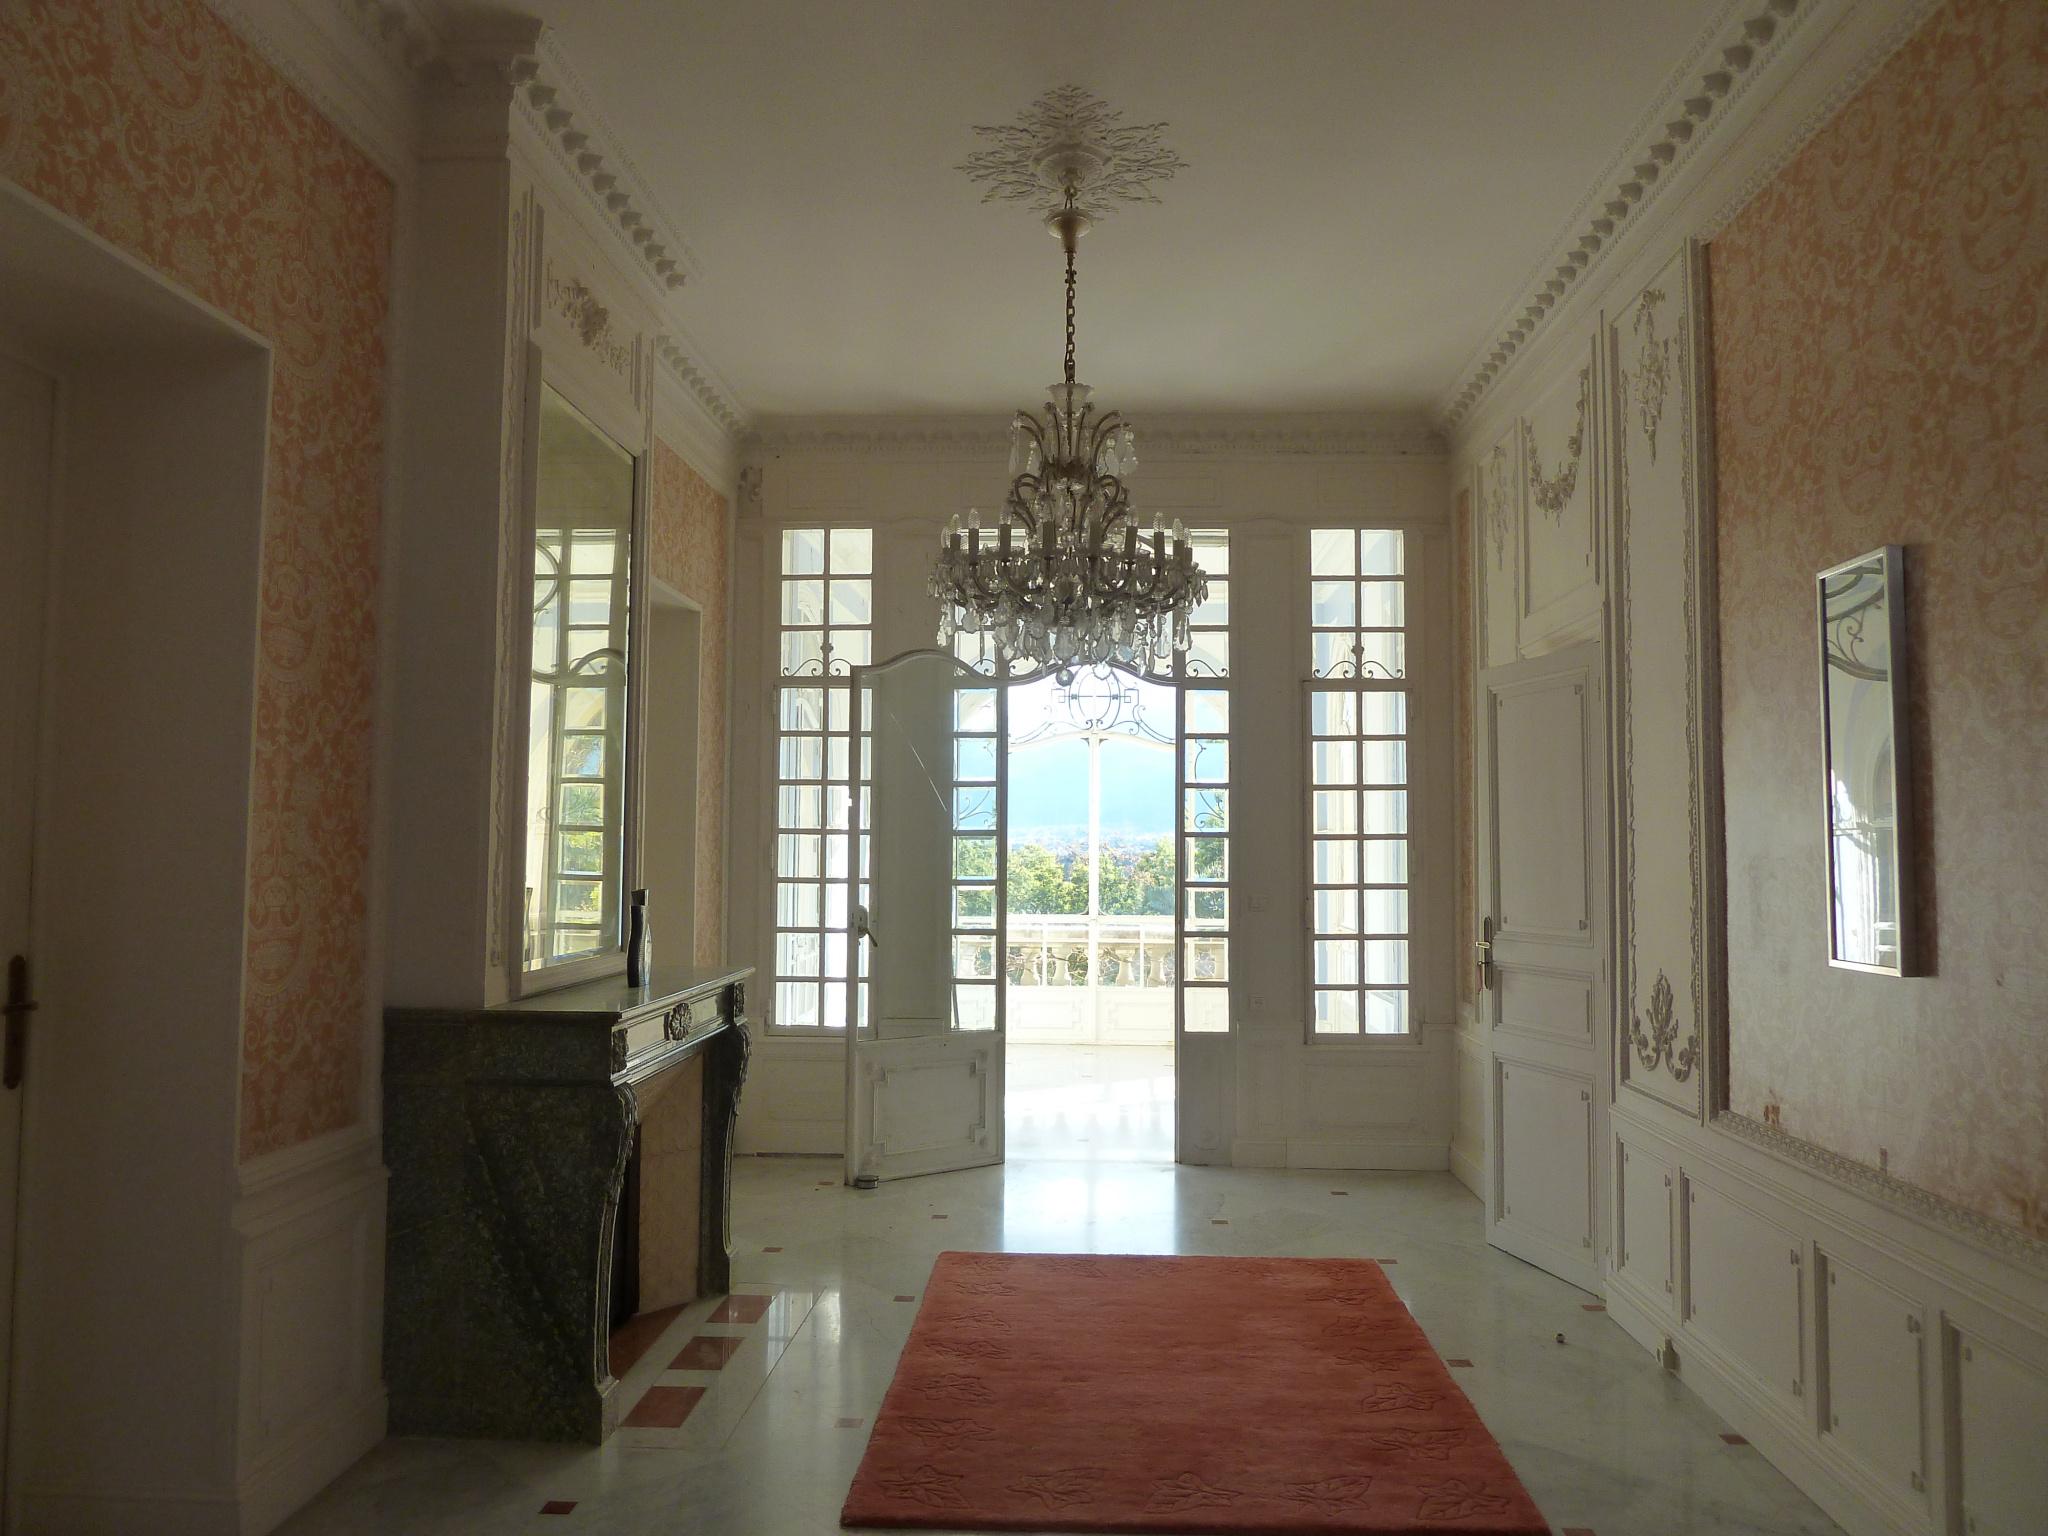 À vendre chateau de 760m2 à brouilla (66620) - Photo 14'